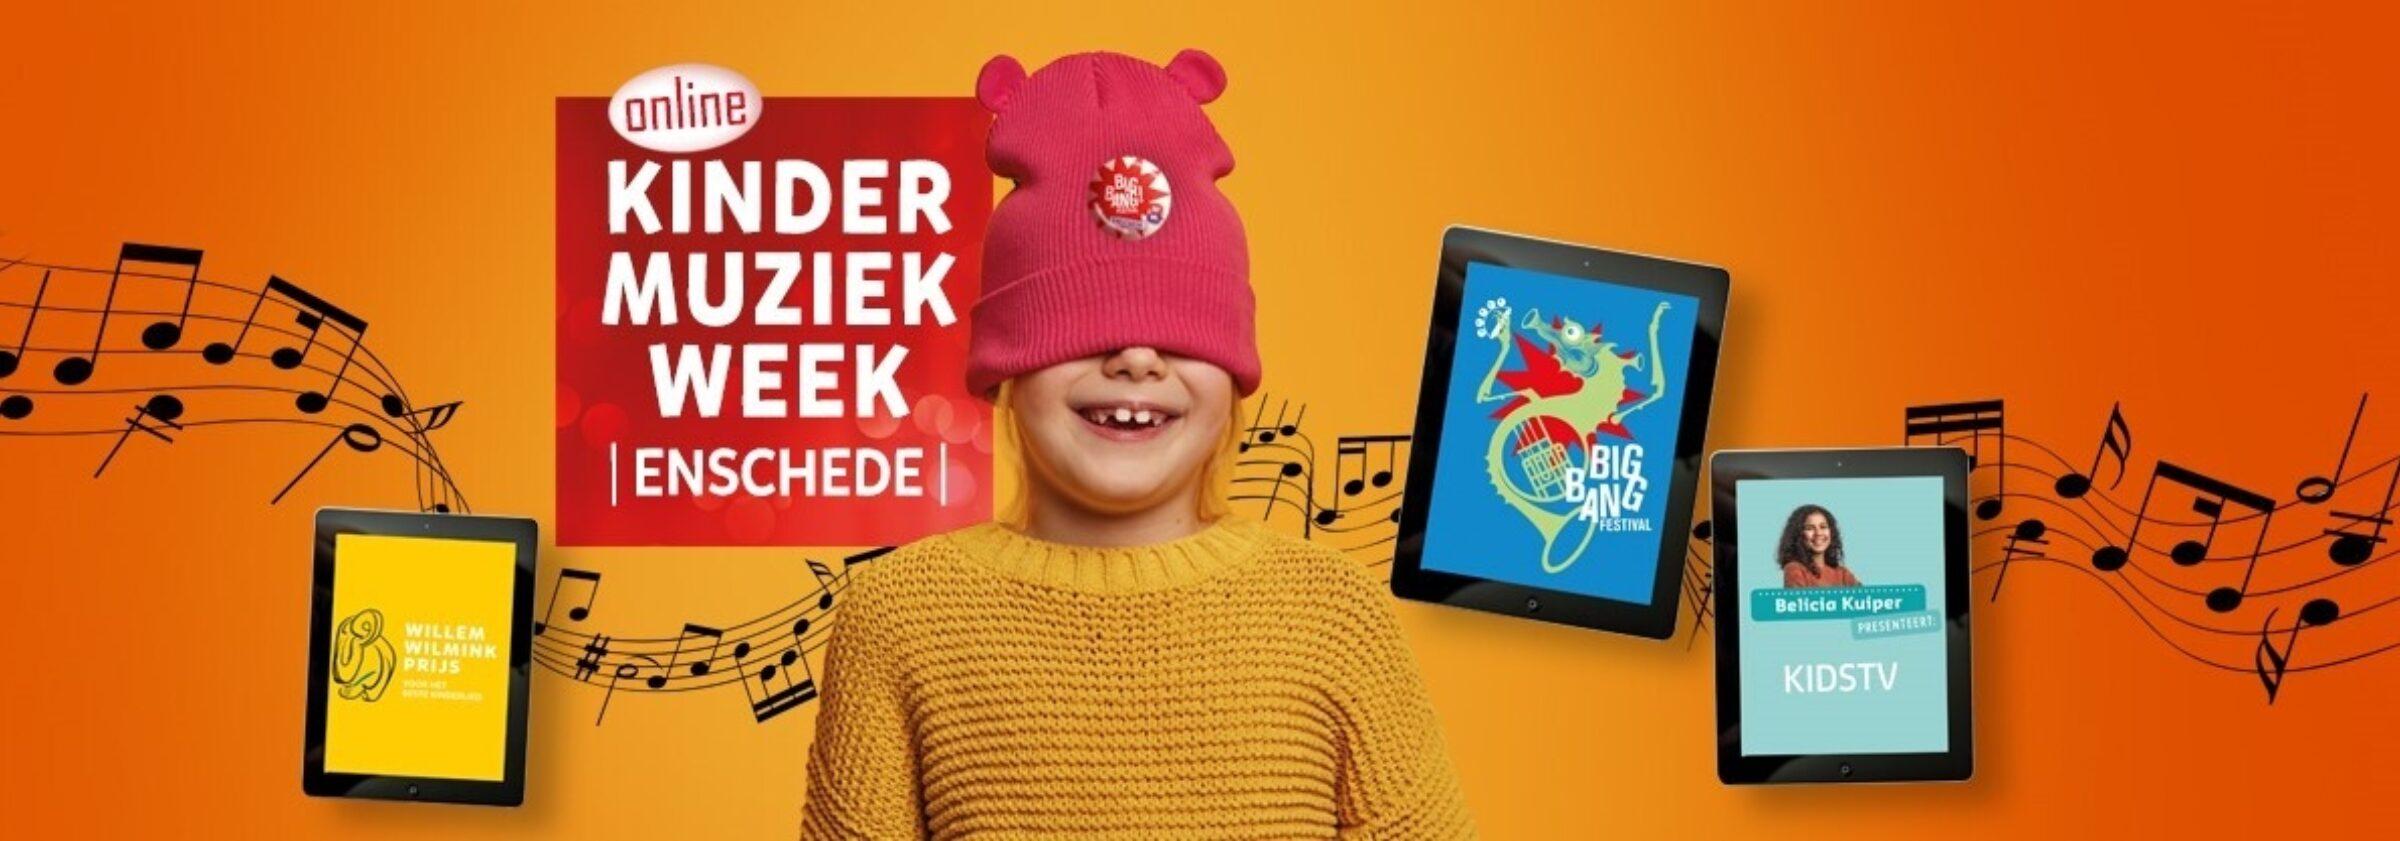 Kindermuziekweek